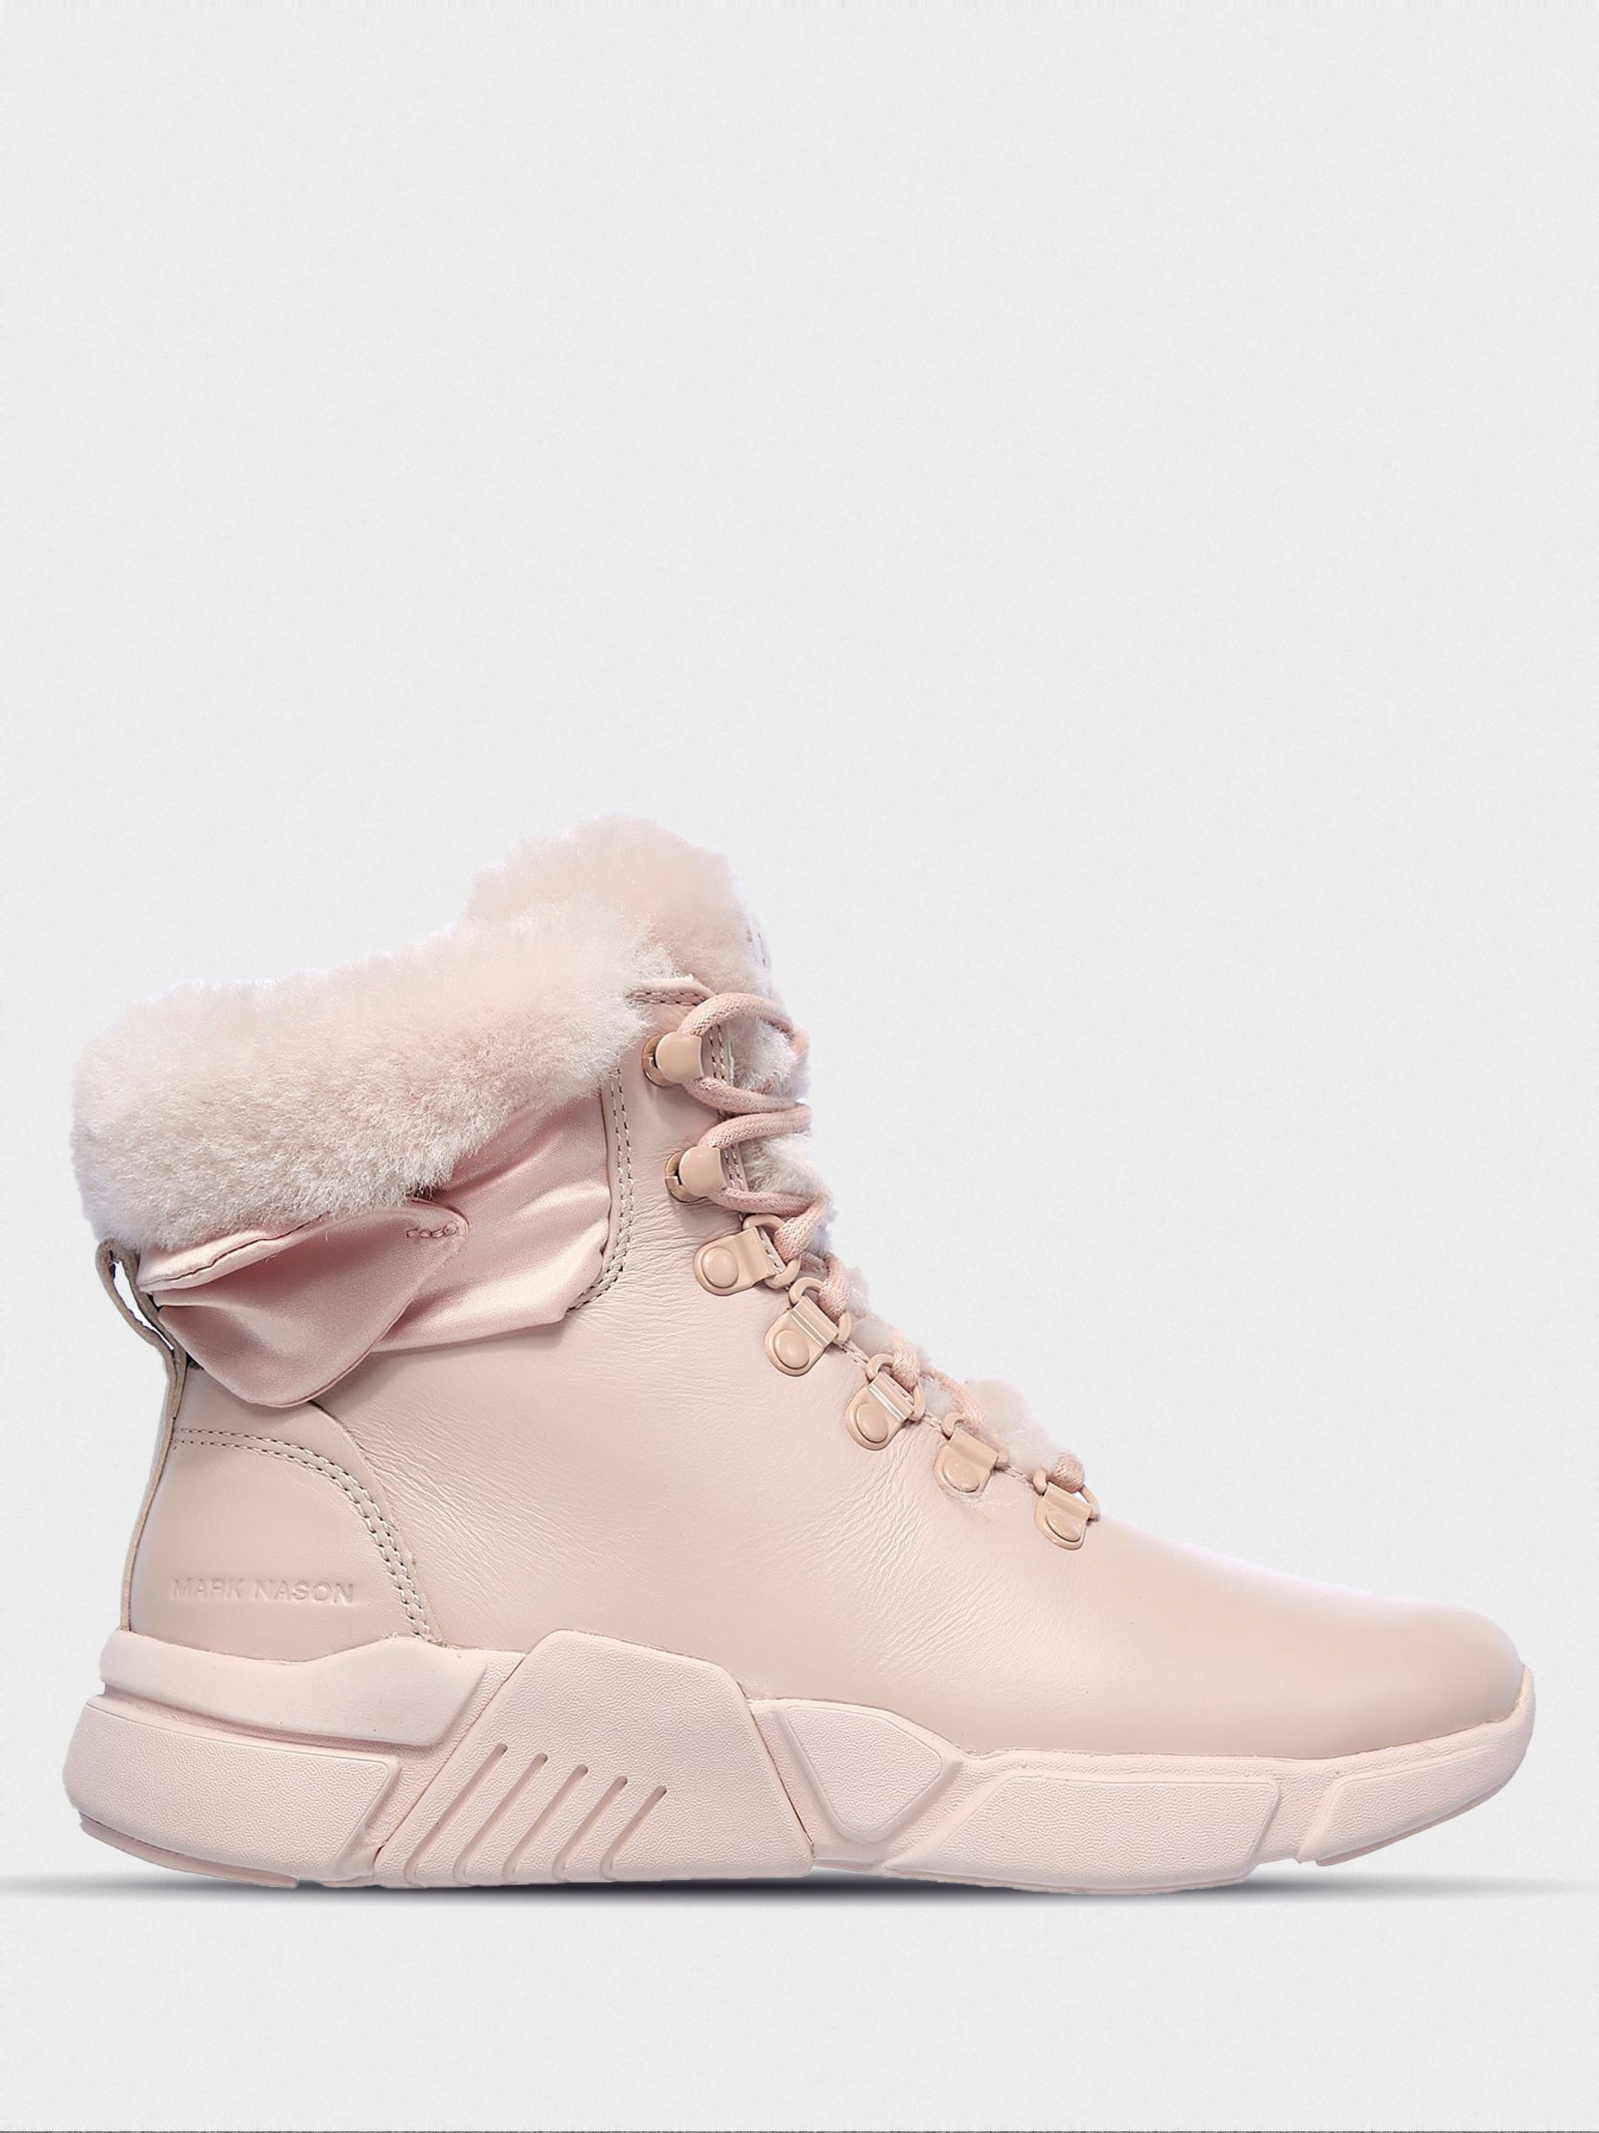 Сапоги женские Skechers Mark Nason KW5850 брендовая обувь, 2017